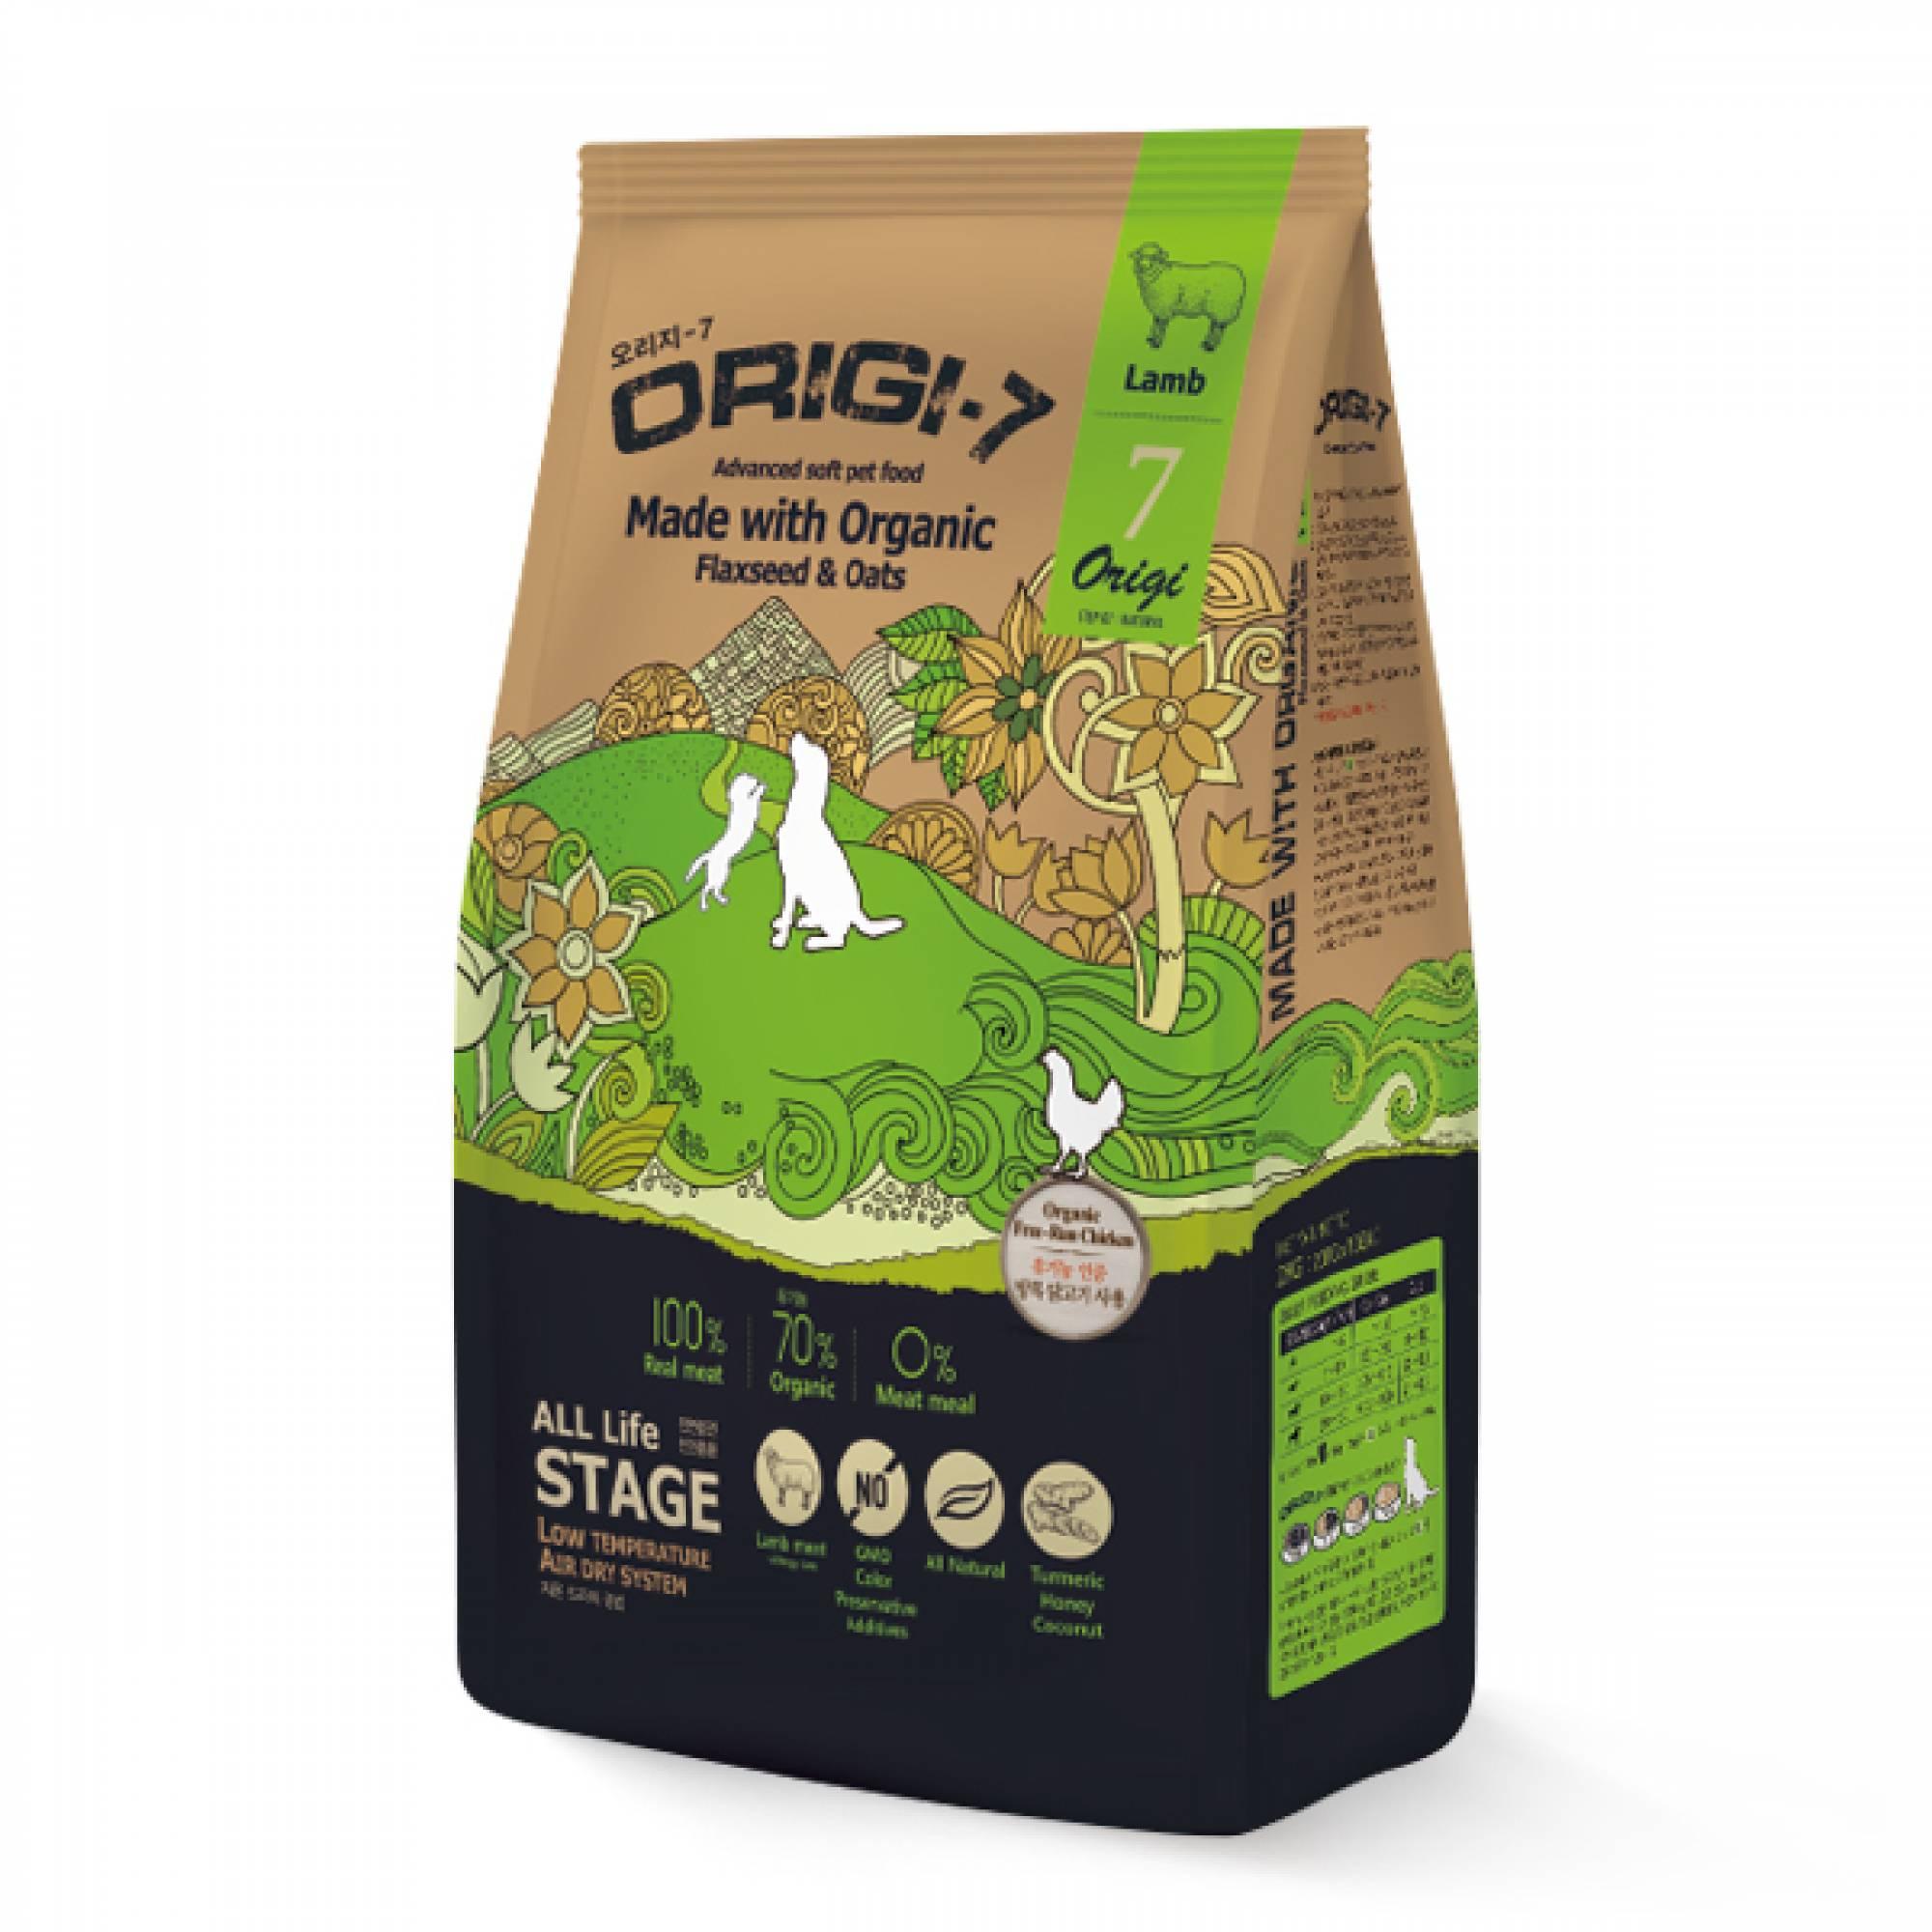 Bow Wow - Dog Origi-7 Air-dried Advanced Soft Pet Food - Lamb 1.2kg (200g x 6 bags)